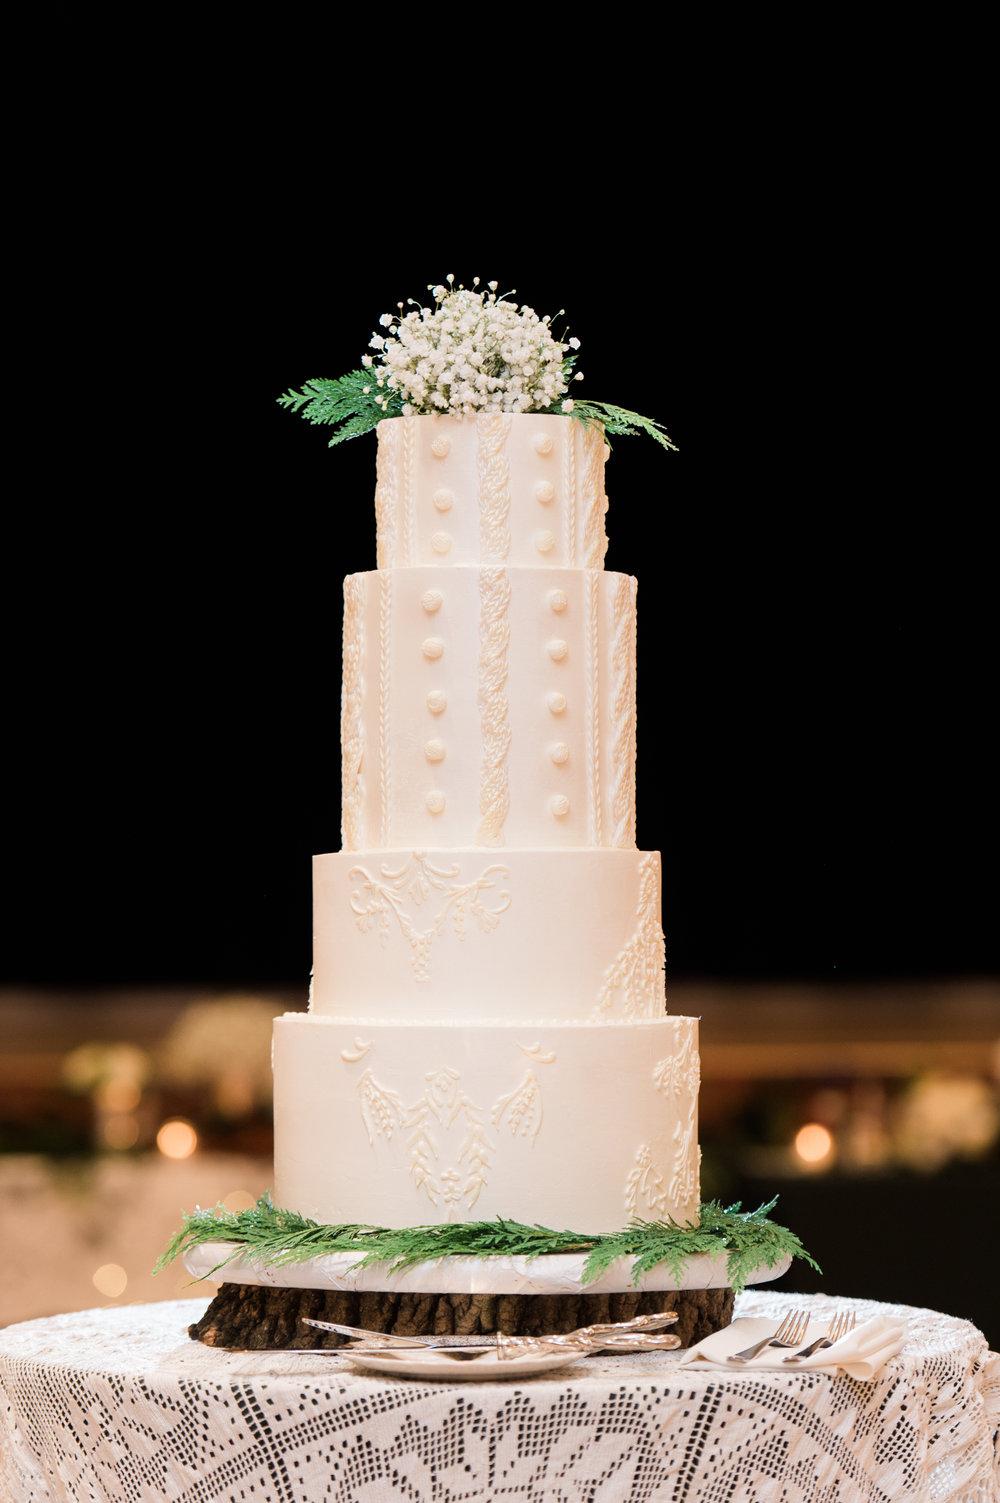 Bonphotage Chicago Fine Art Wedding Photography - Irish American Heritage Center